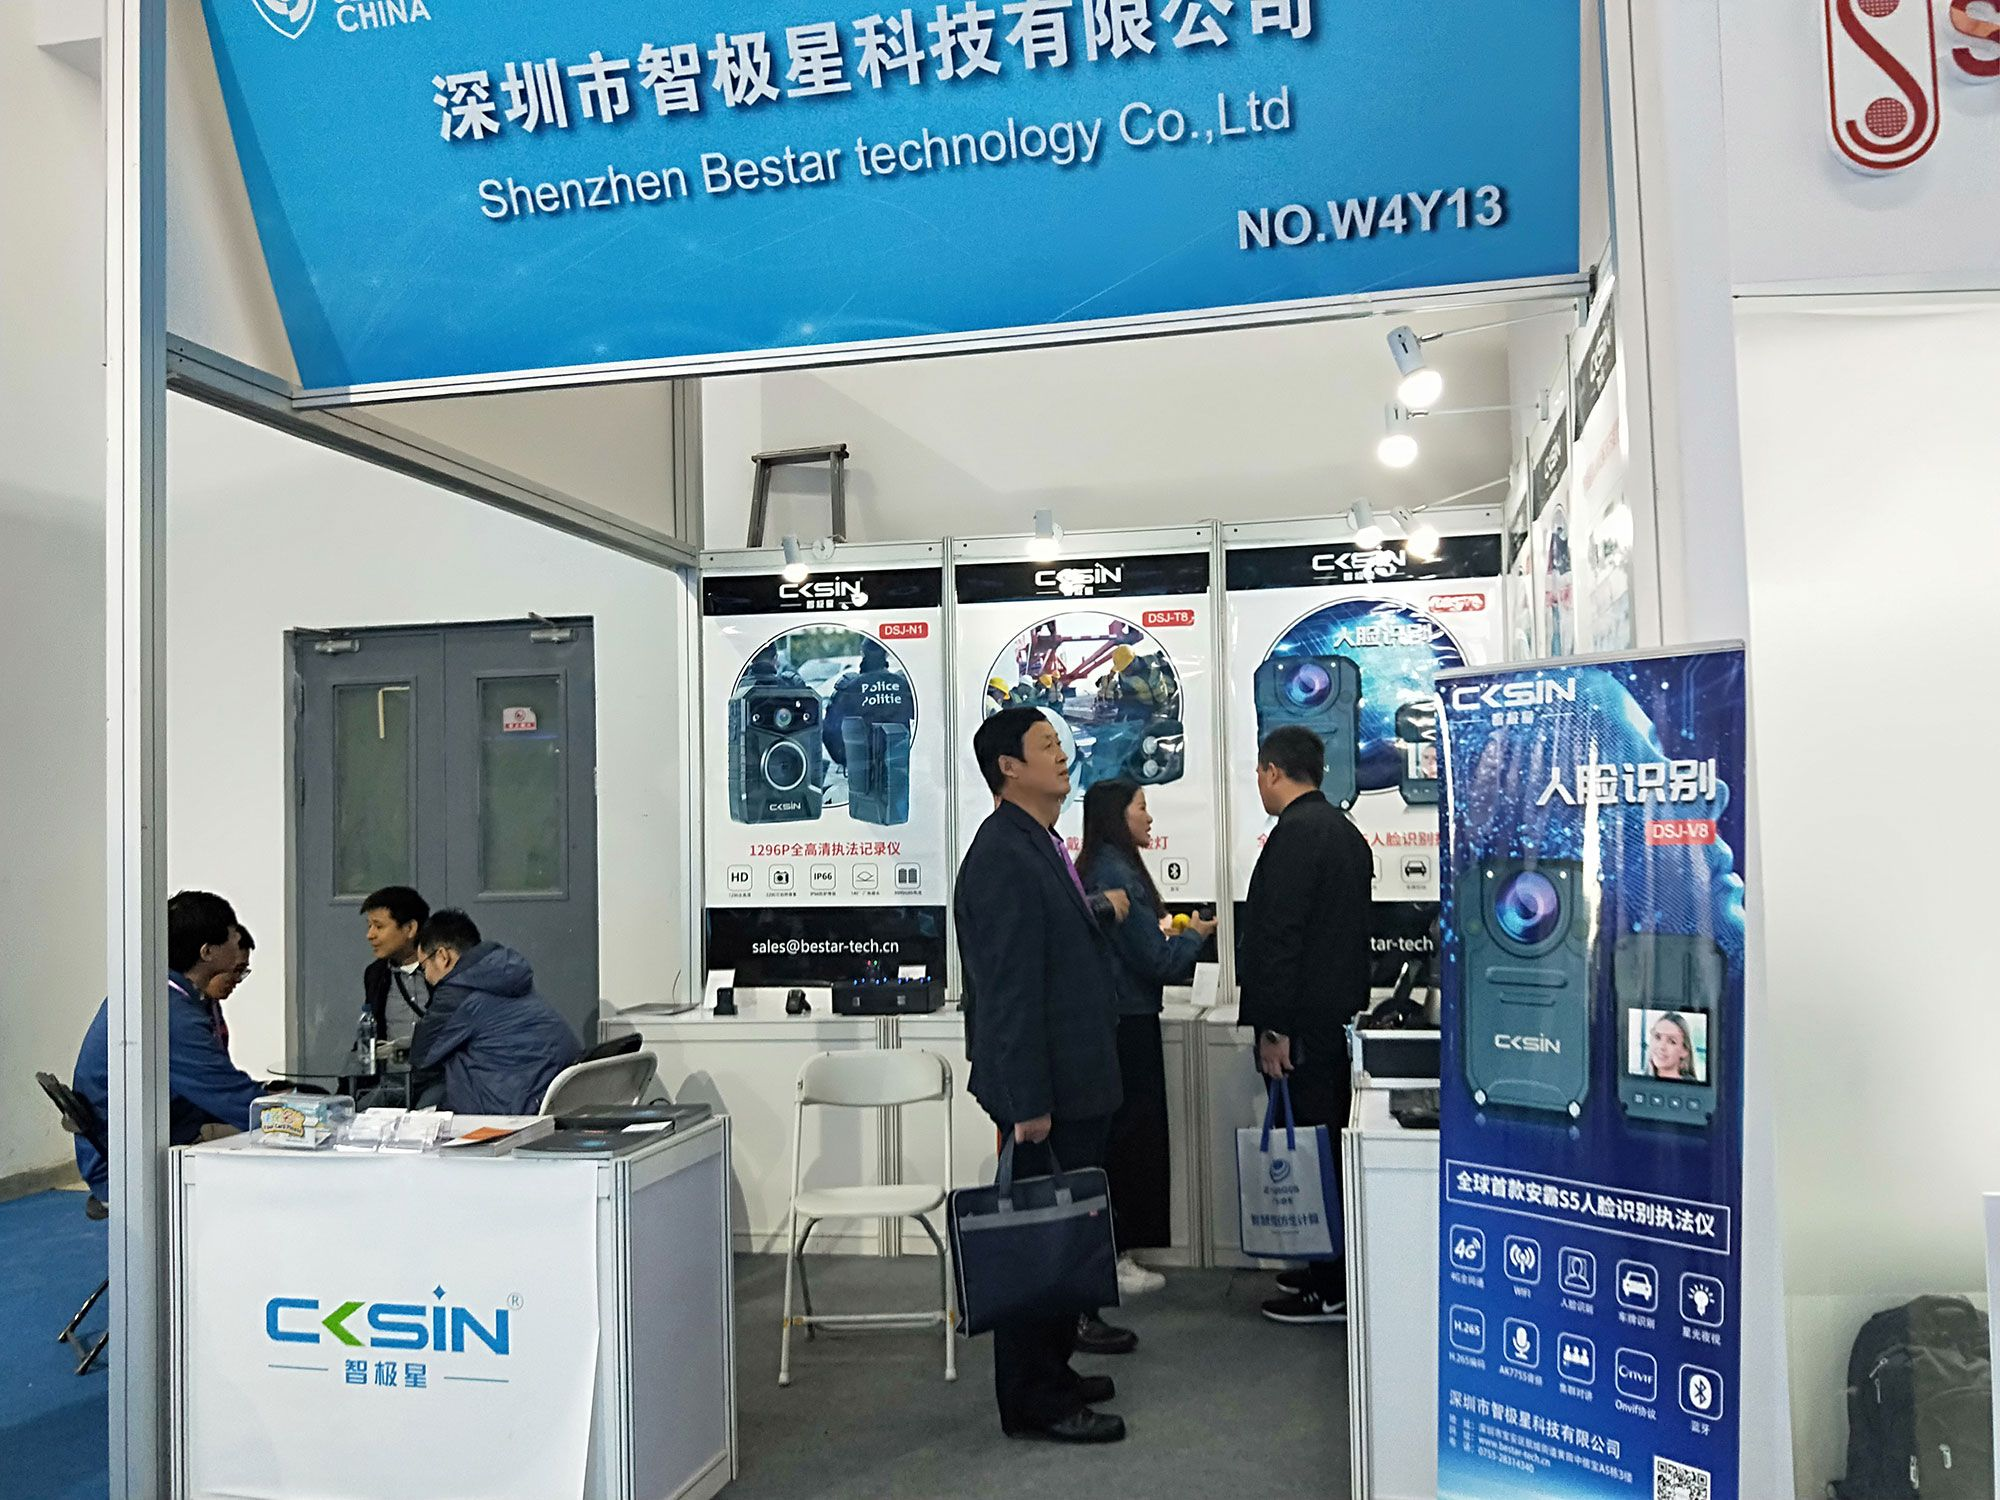 Shenzhen Bestar Technology Co Ltd Tel 86 0755 28314340 E Mail